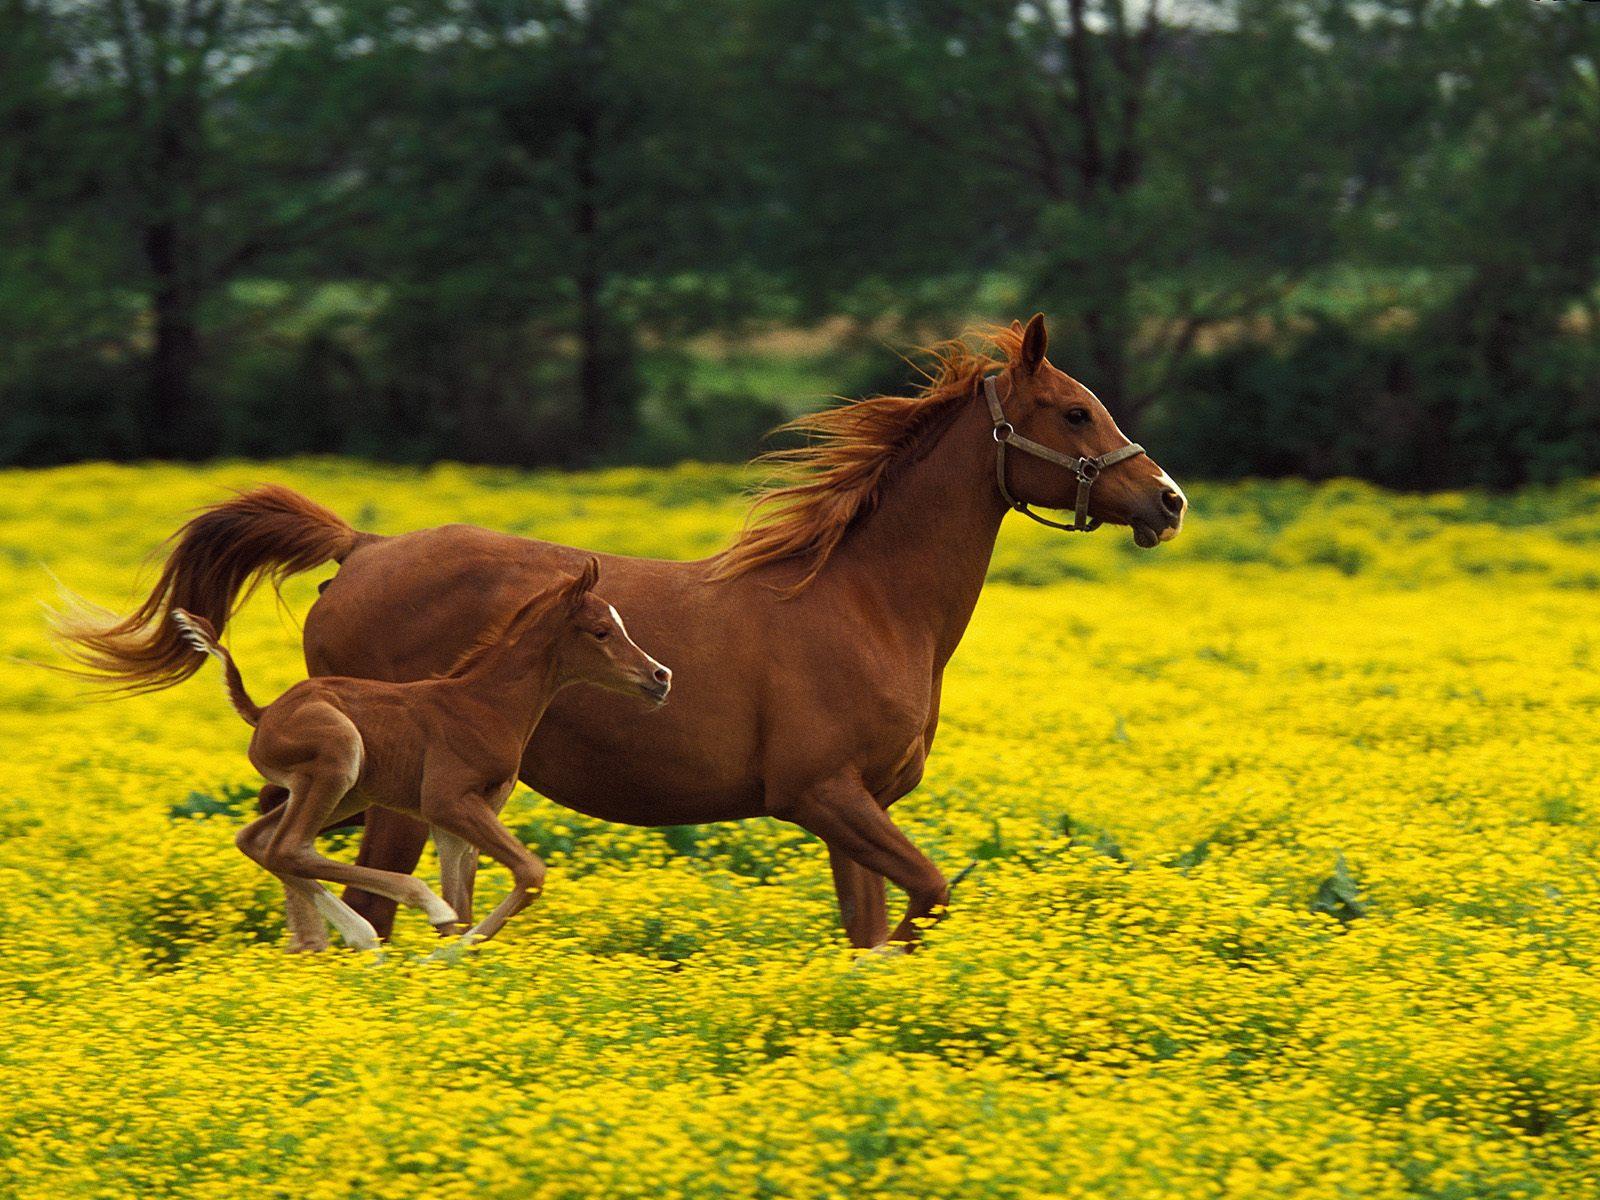 Top   Wallpaper Horse Yellow - The-best-top-desktop-horse-wallpapers-18  Best Photo Reference_661094.jpg